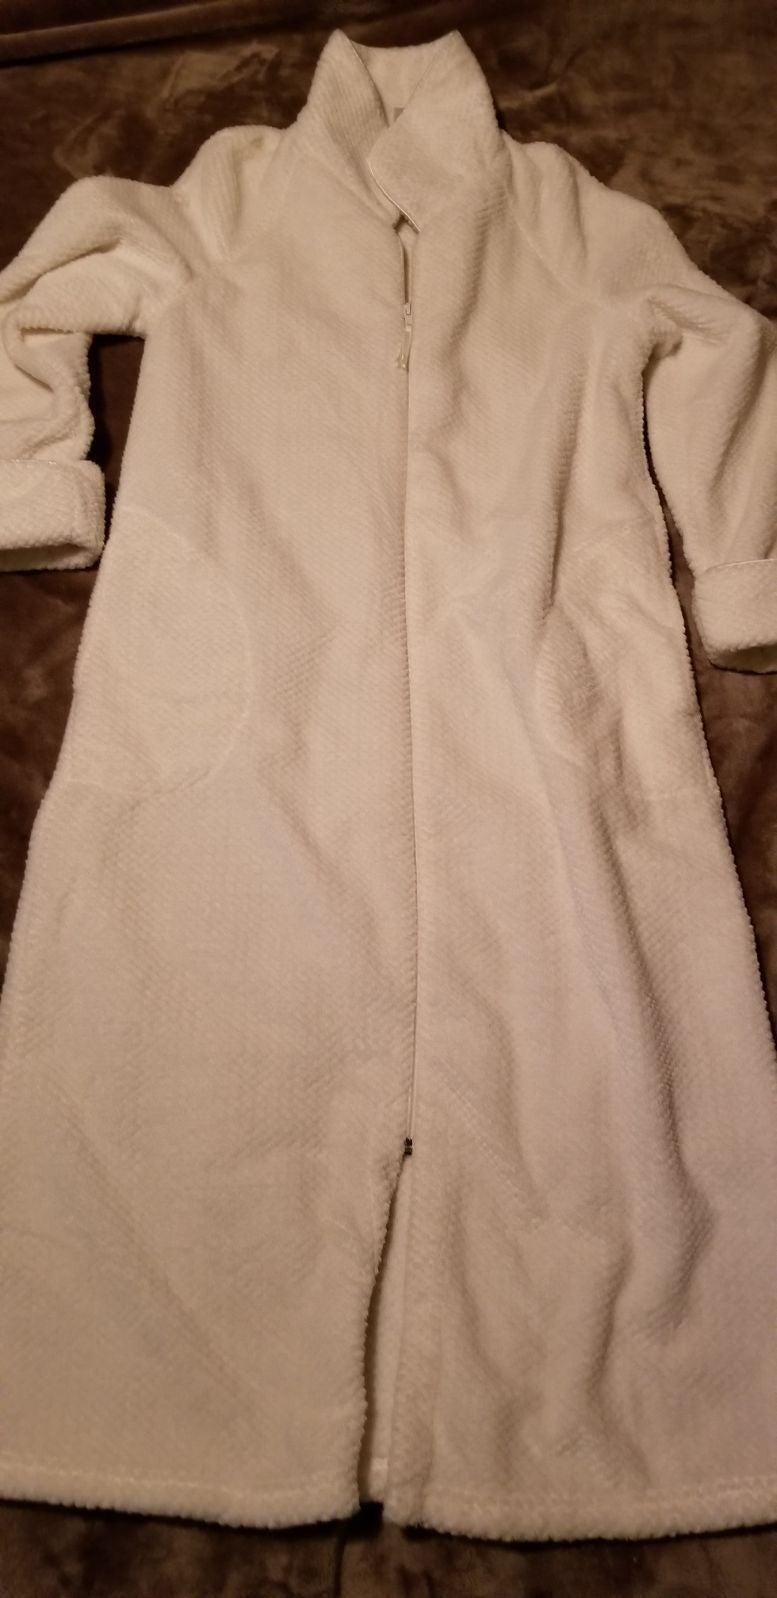 Womens Xs Ivory Zip Up Bath Robe